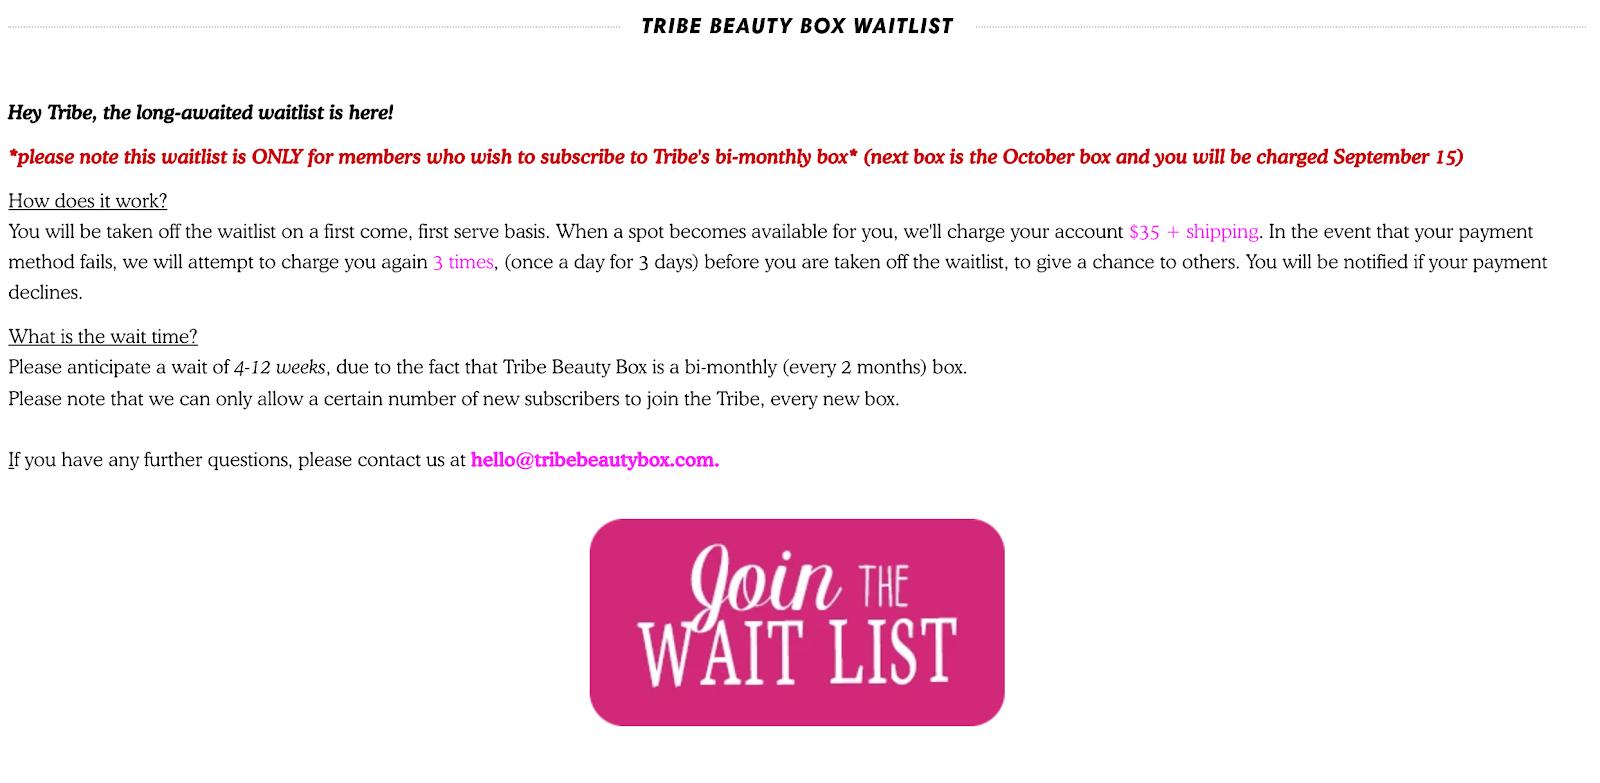 join the wait list